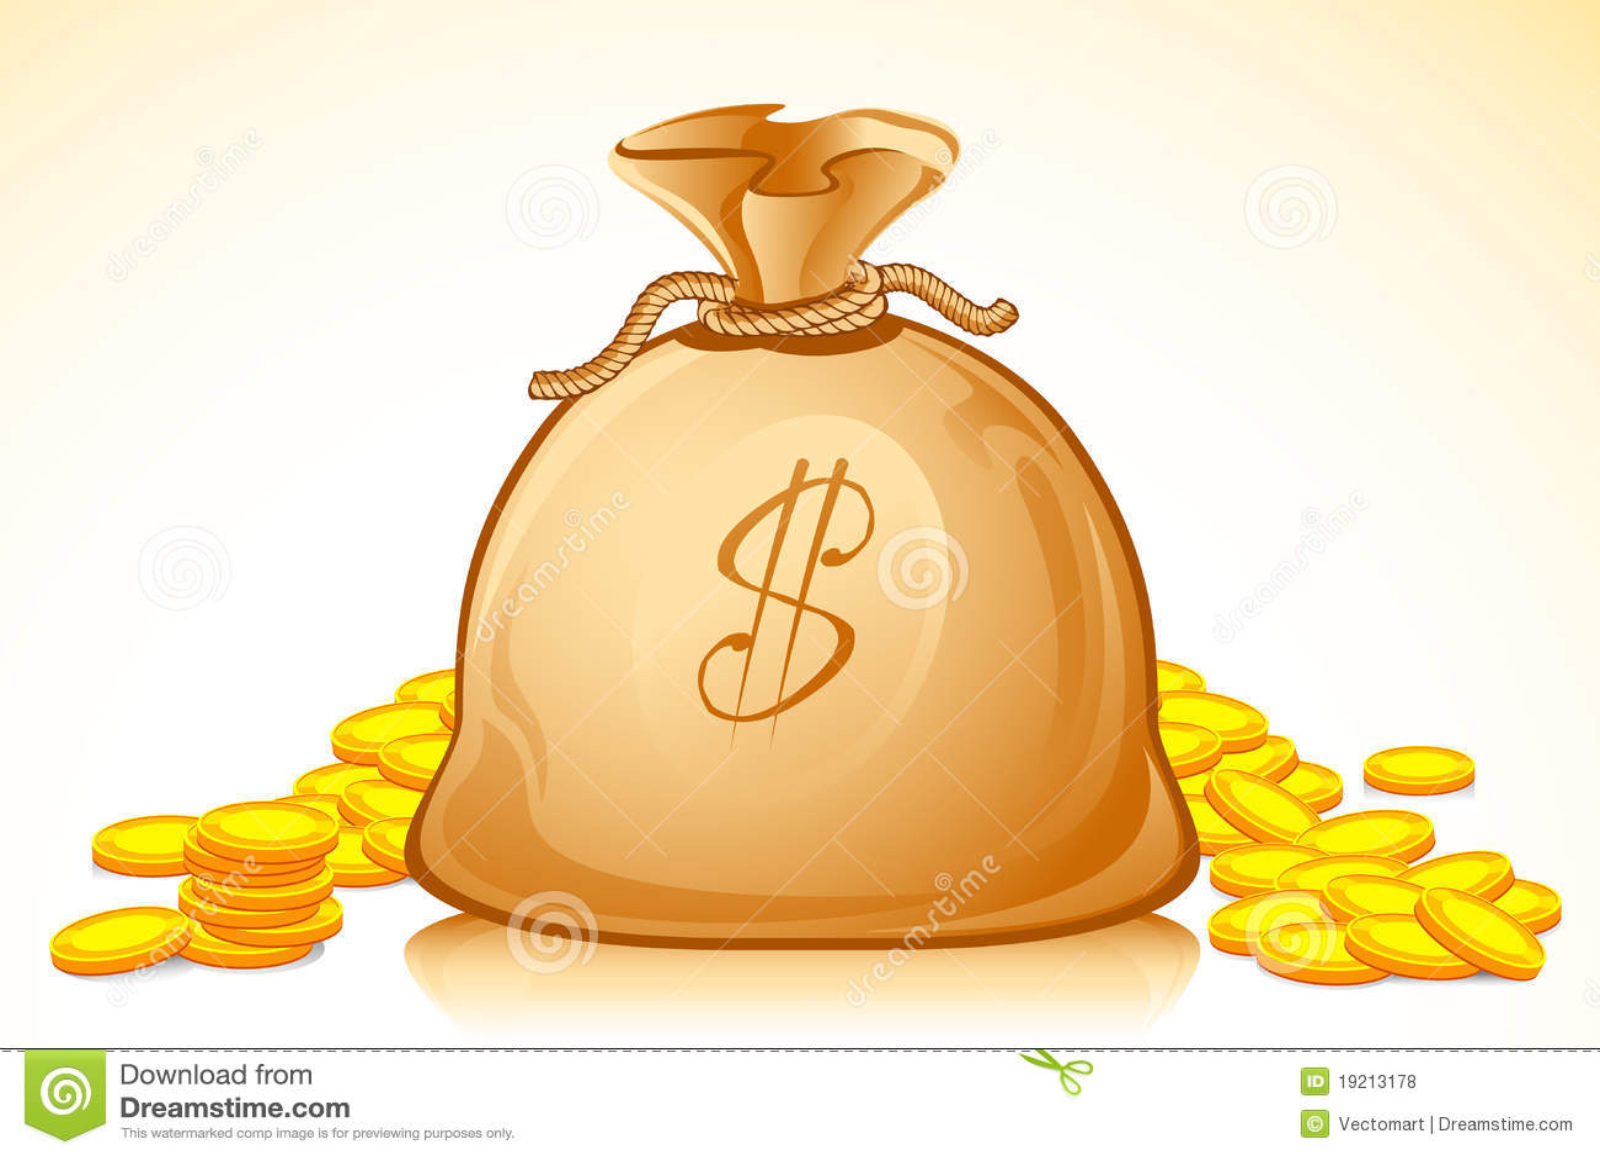 Dollar Money Bag Royalty Free Stock Photos - Image: 19213178